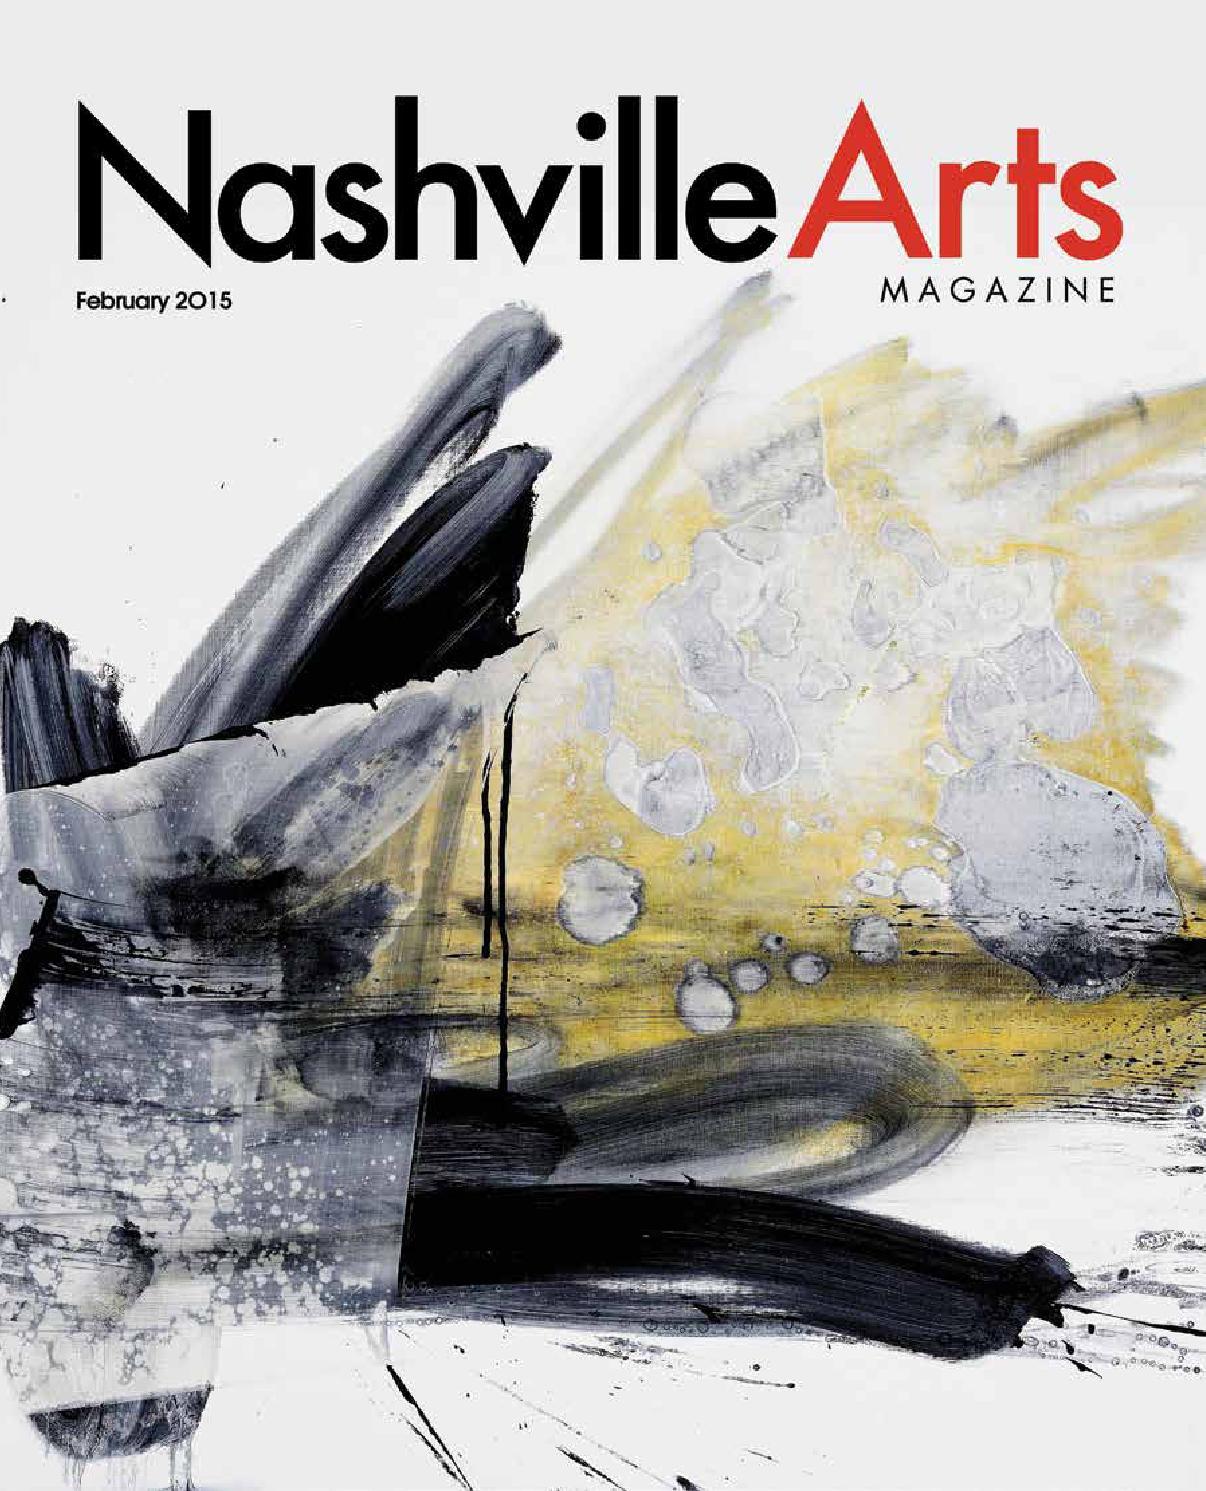 February 2015 Nashville Arts Magazine By Issuu Full Body Workouts On Pinterest Melissa Bender Circuit And